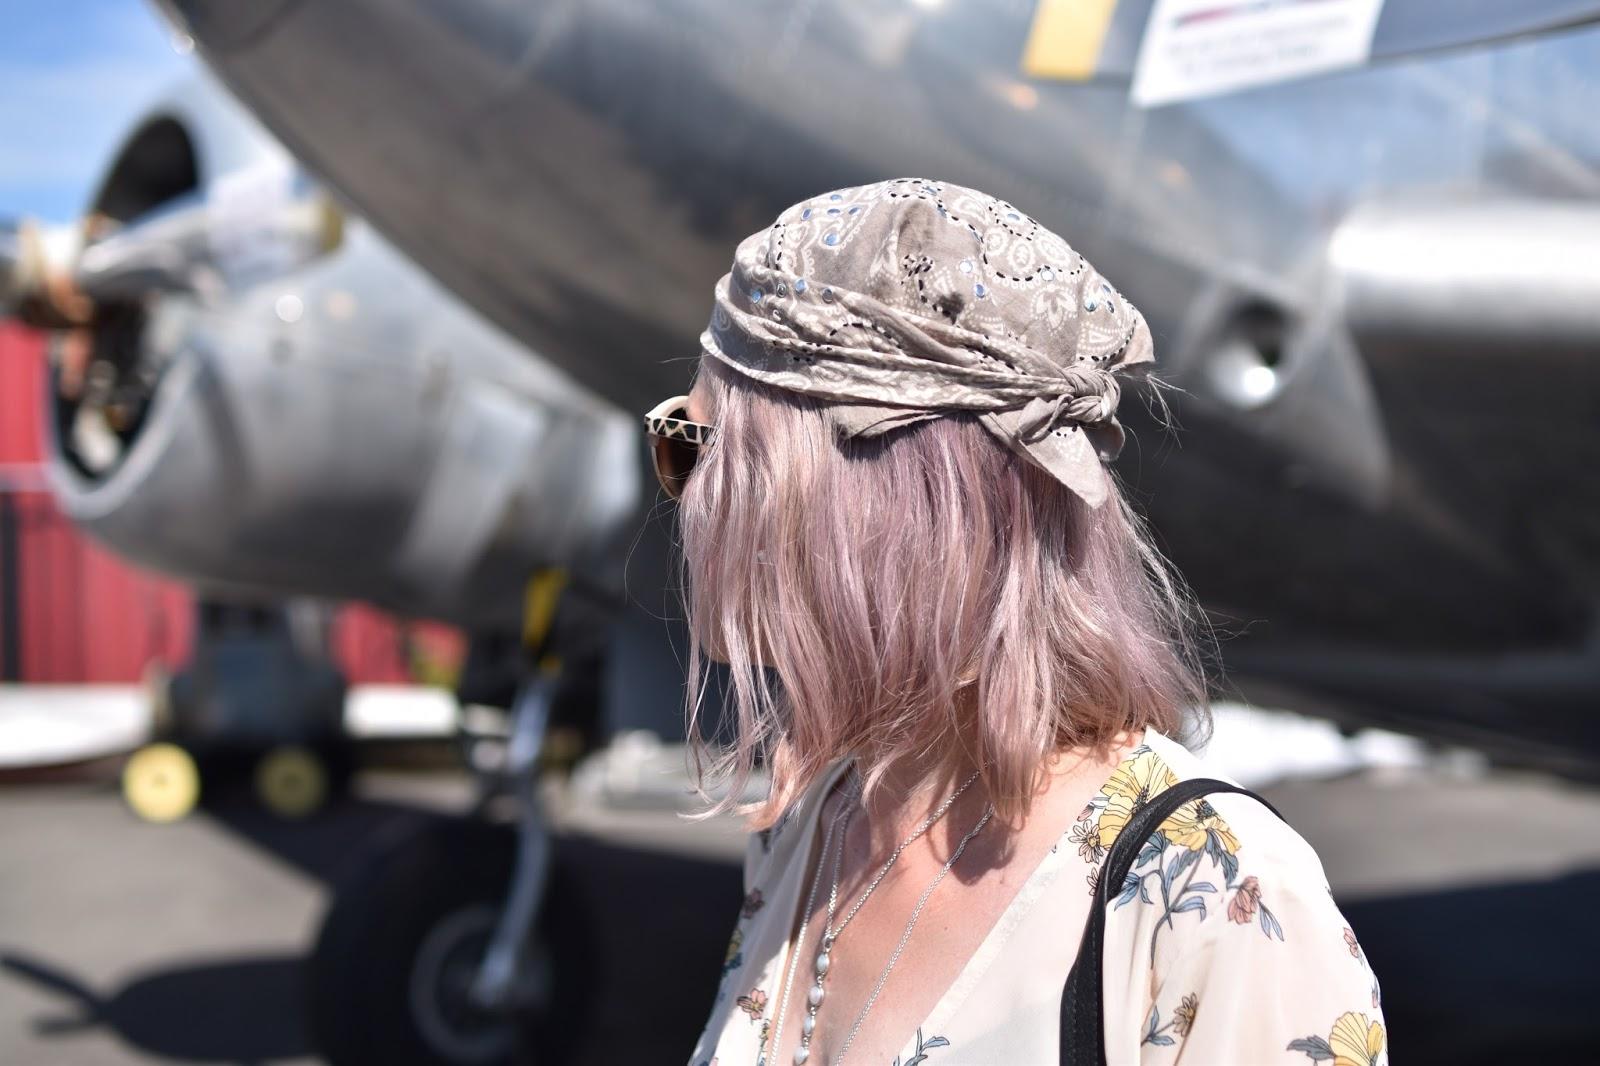 Monika Faulkner outfit inspiration - floral blouse, bandana head scarf, Nanette sunglasses